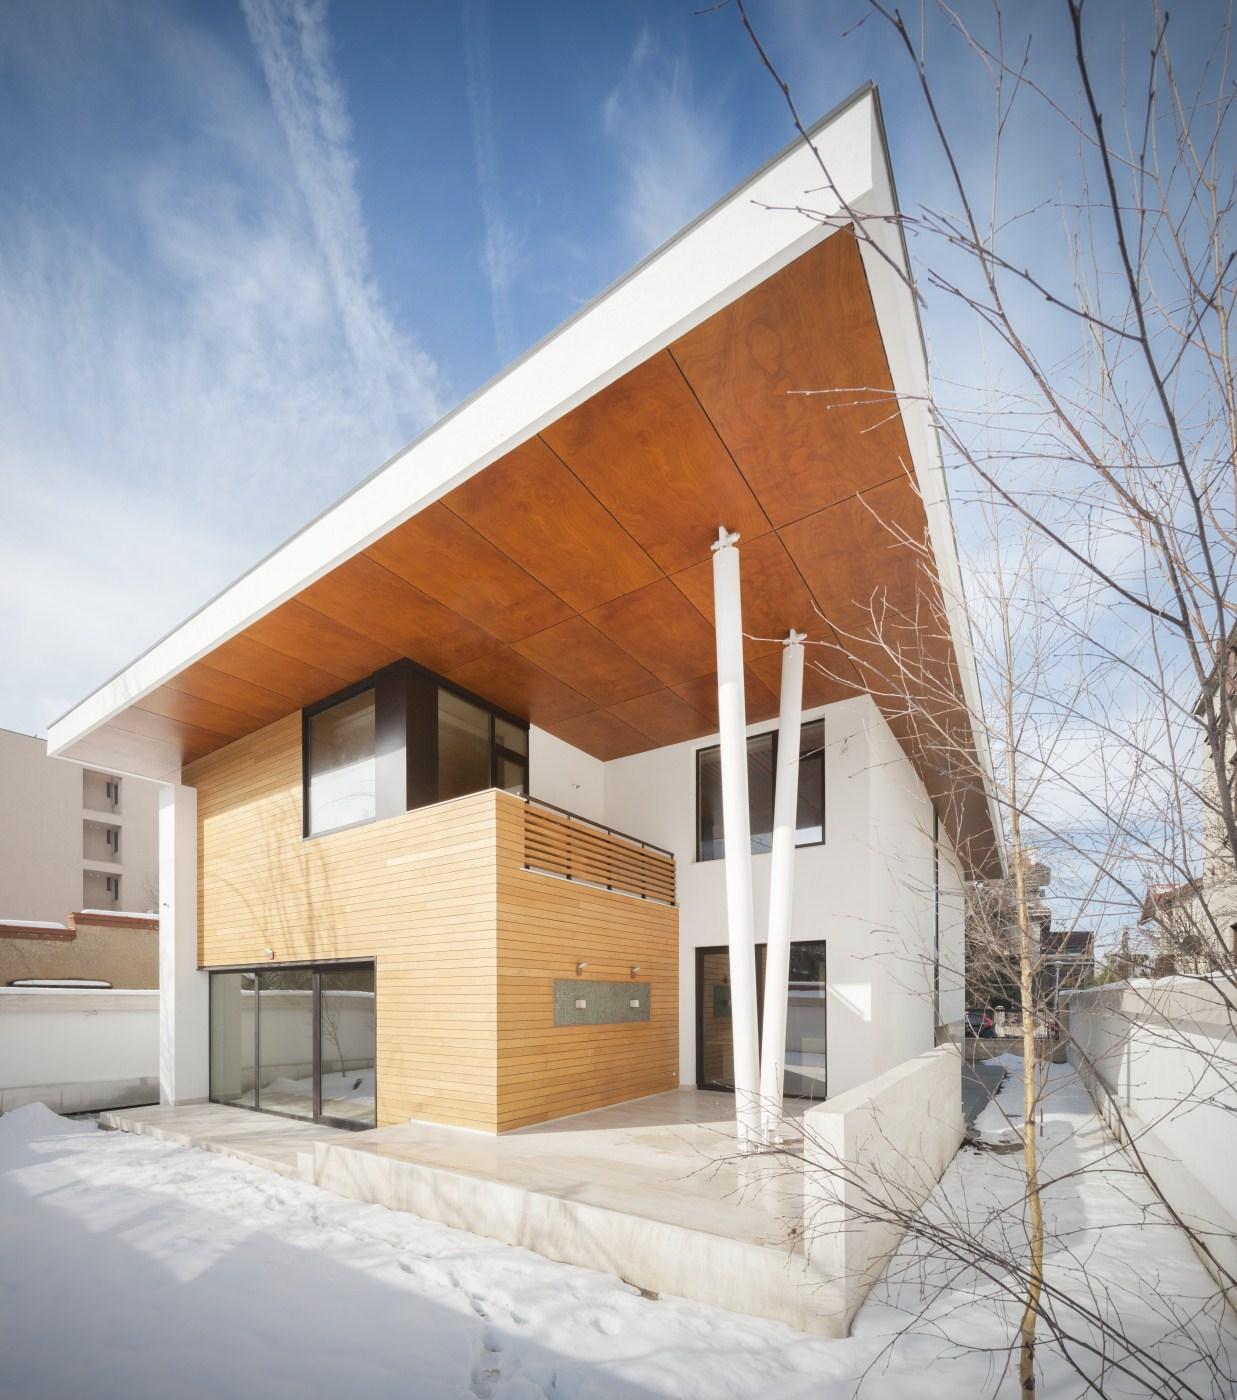 https://nbc-arhitect.ro/wp-content/uploads/2020/10/NBC-ARHITECT-_-housing-_-Sandu-Aldea-House-Villa-_-exterior-view_5.jpg